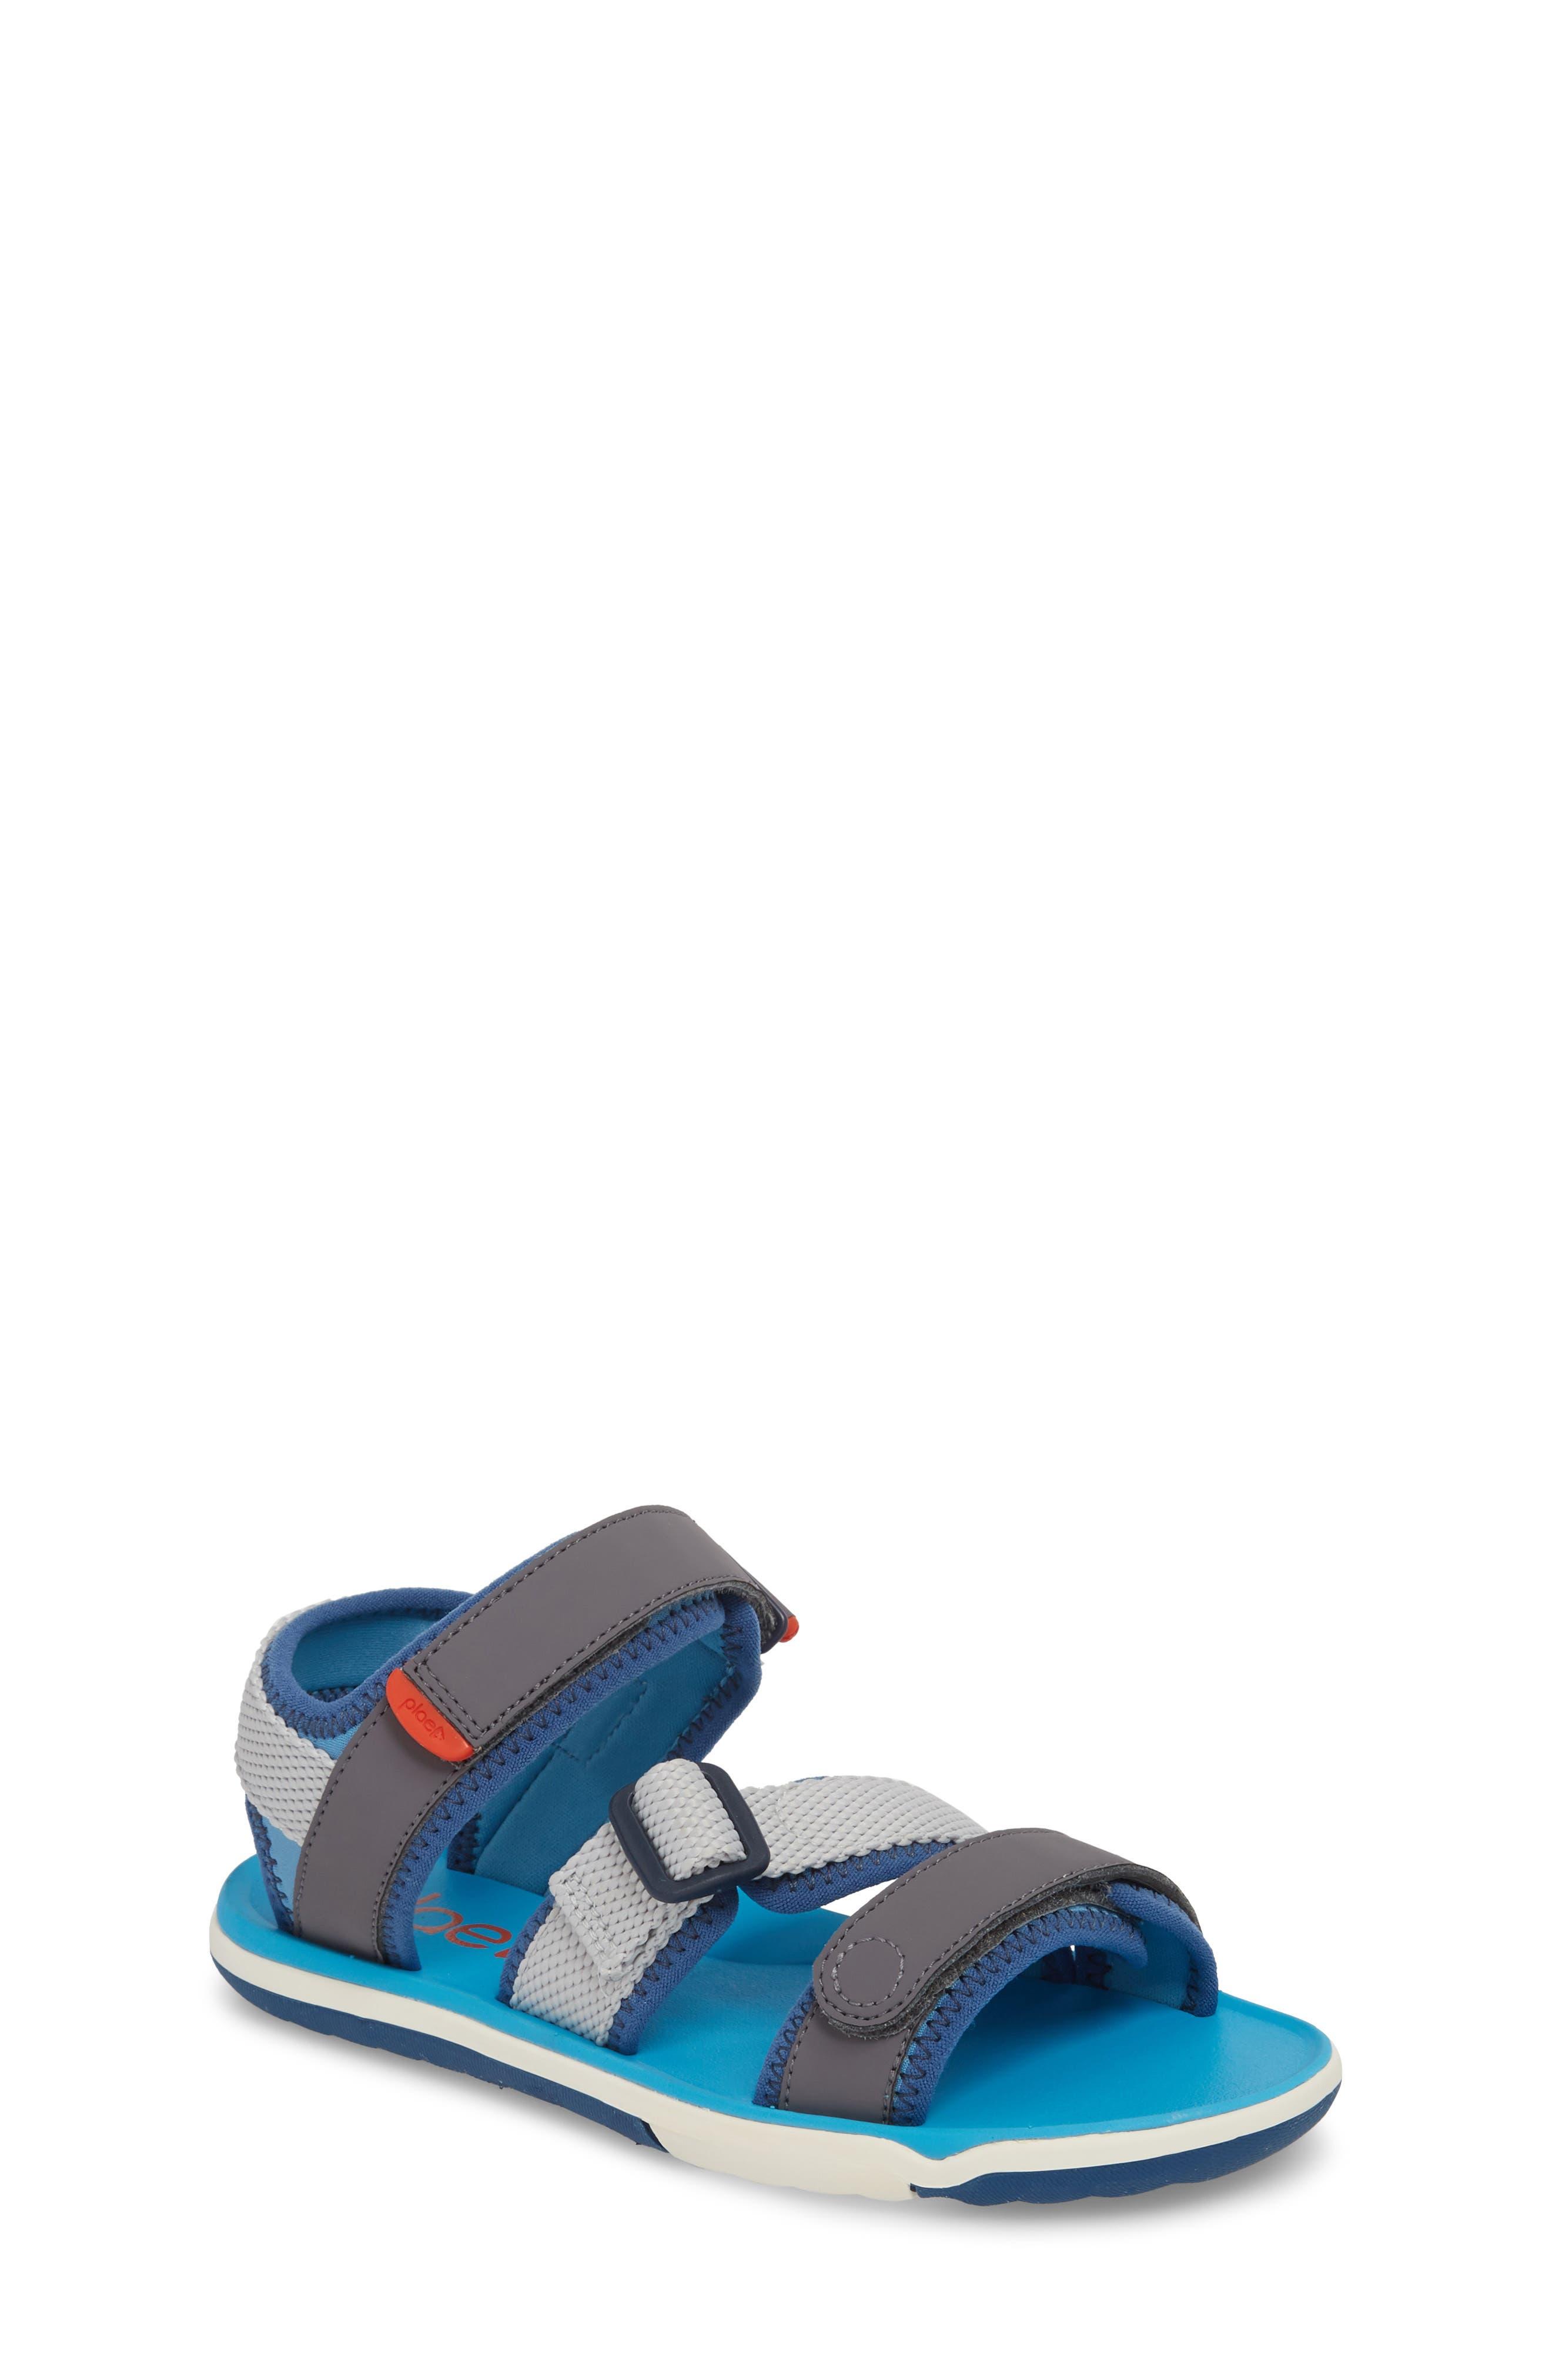 Wes Customizable Sandal,                         Main,                         color, Aloha Blue